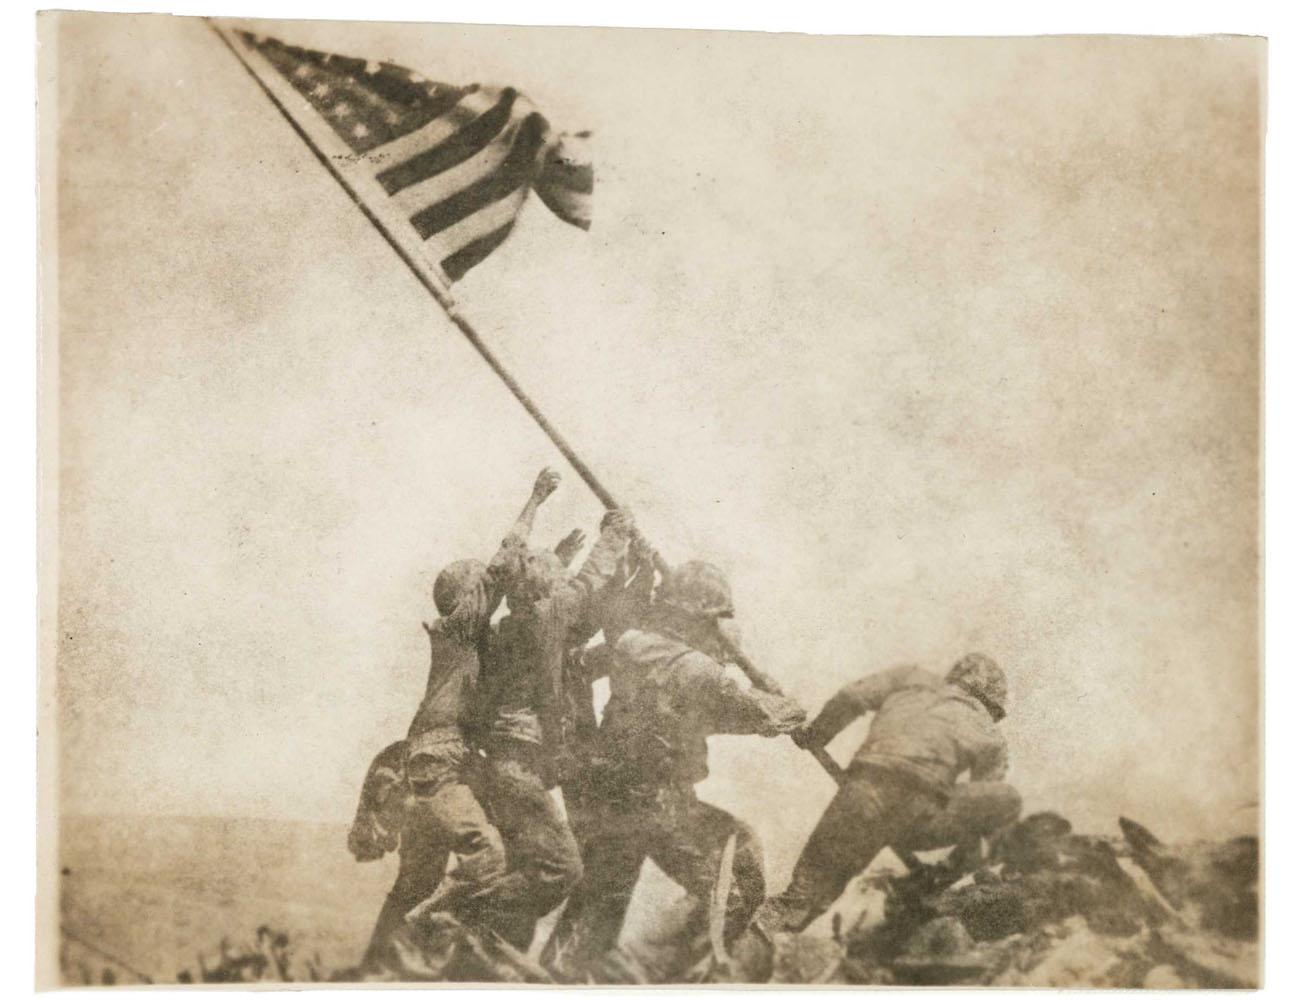 Old Glory Goes Up on Mount Suribachi, Iwo Jima                               Feb. 23, 1945                                Joe Rosenthal, American, 1911-2006